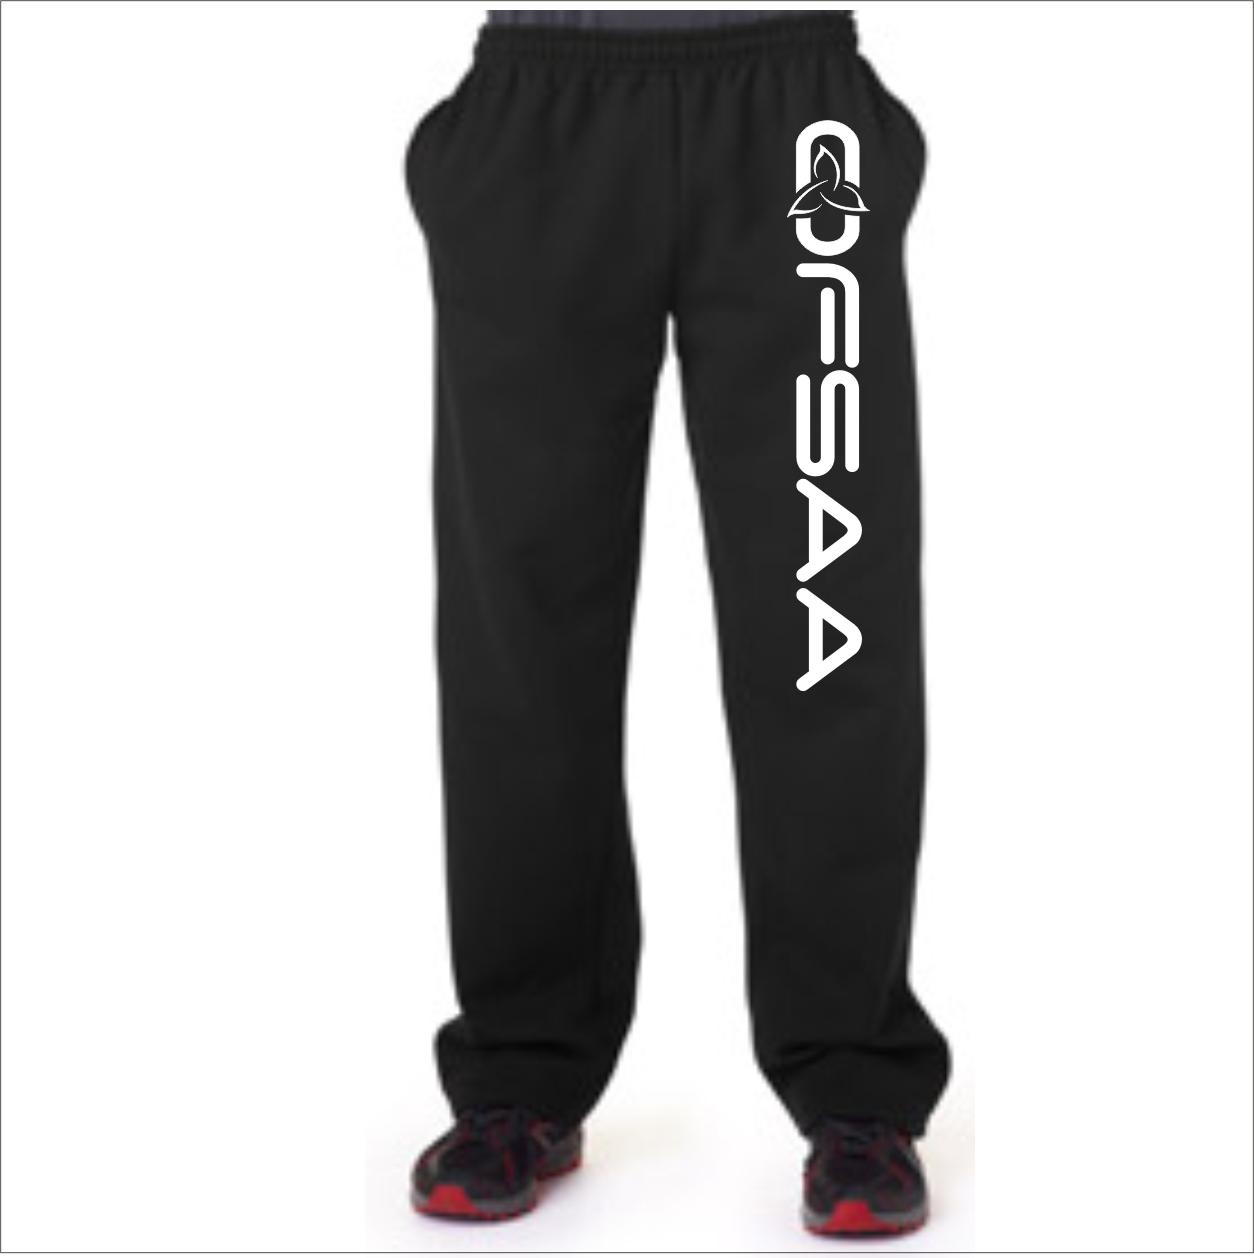 OFSAA guy pants single.jpg